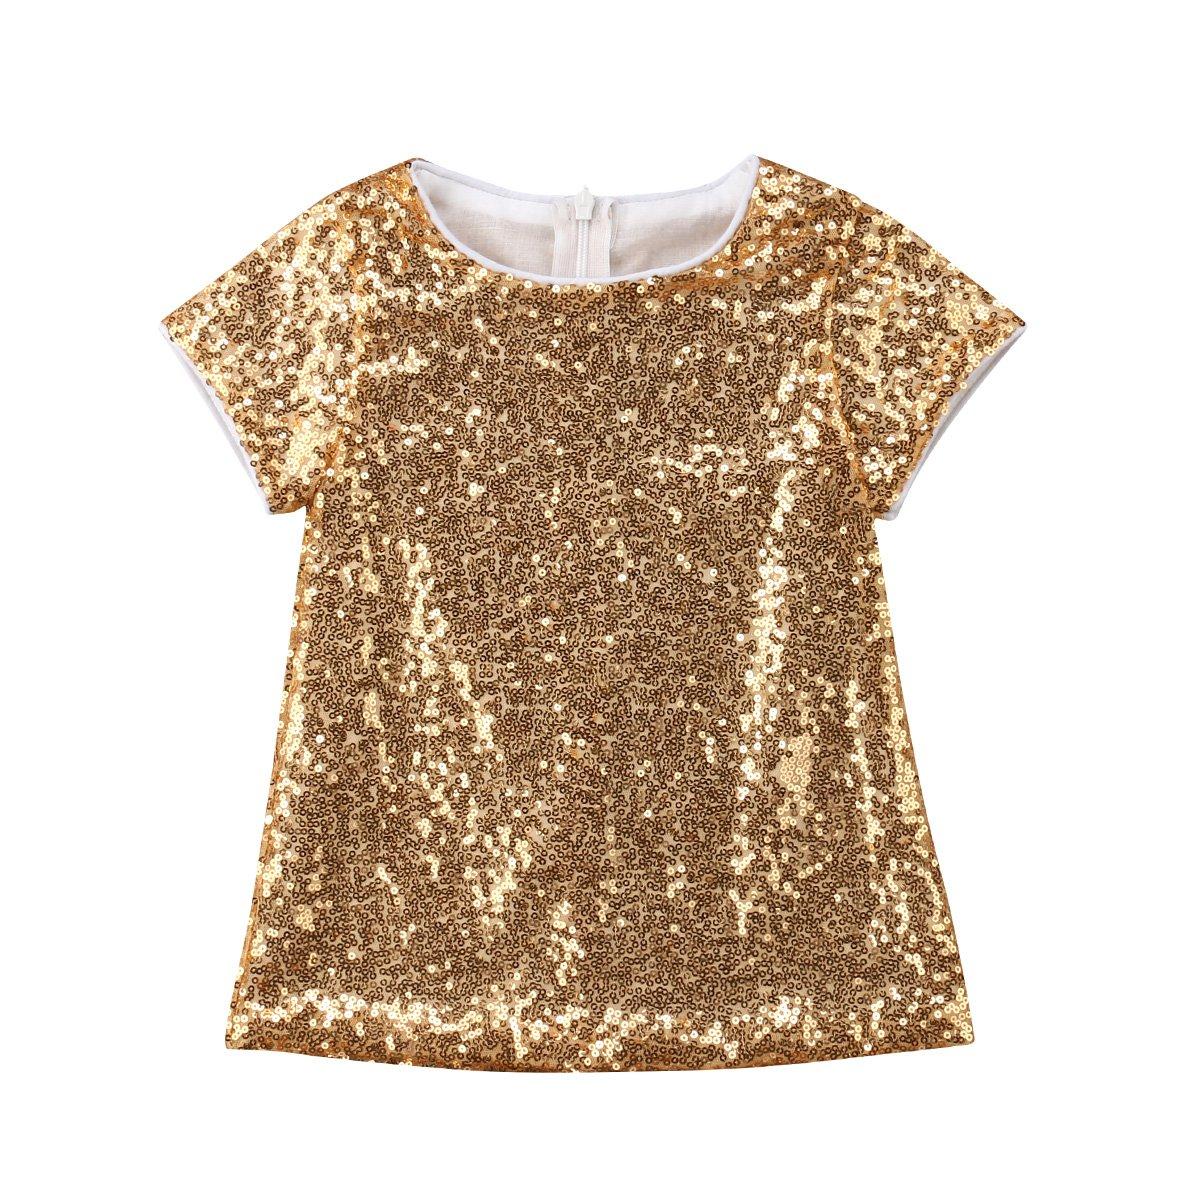 129f9aff26e9 Amazon.com  YAZAD Toddler Kid Baby Girl Gold Sequins Dress Short ...